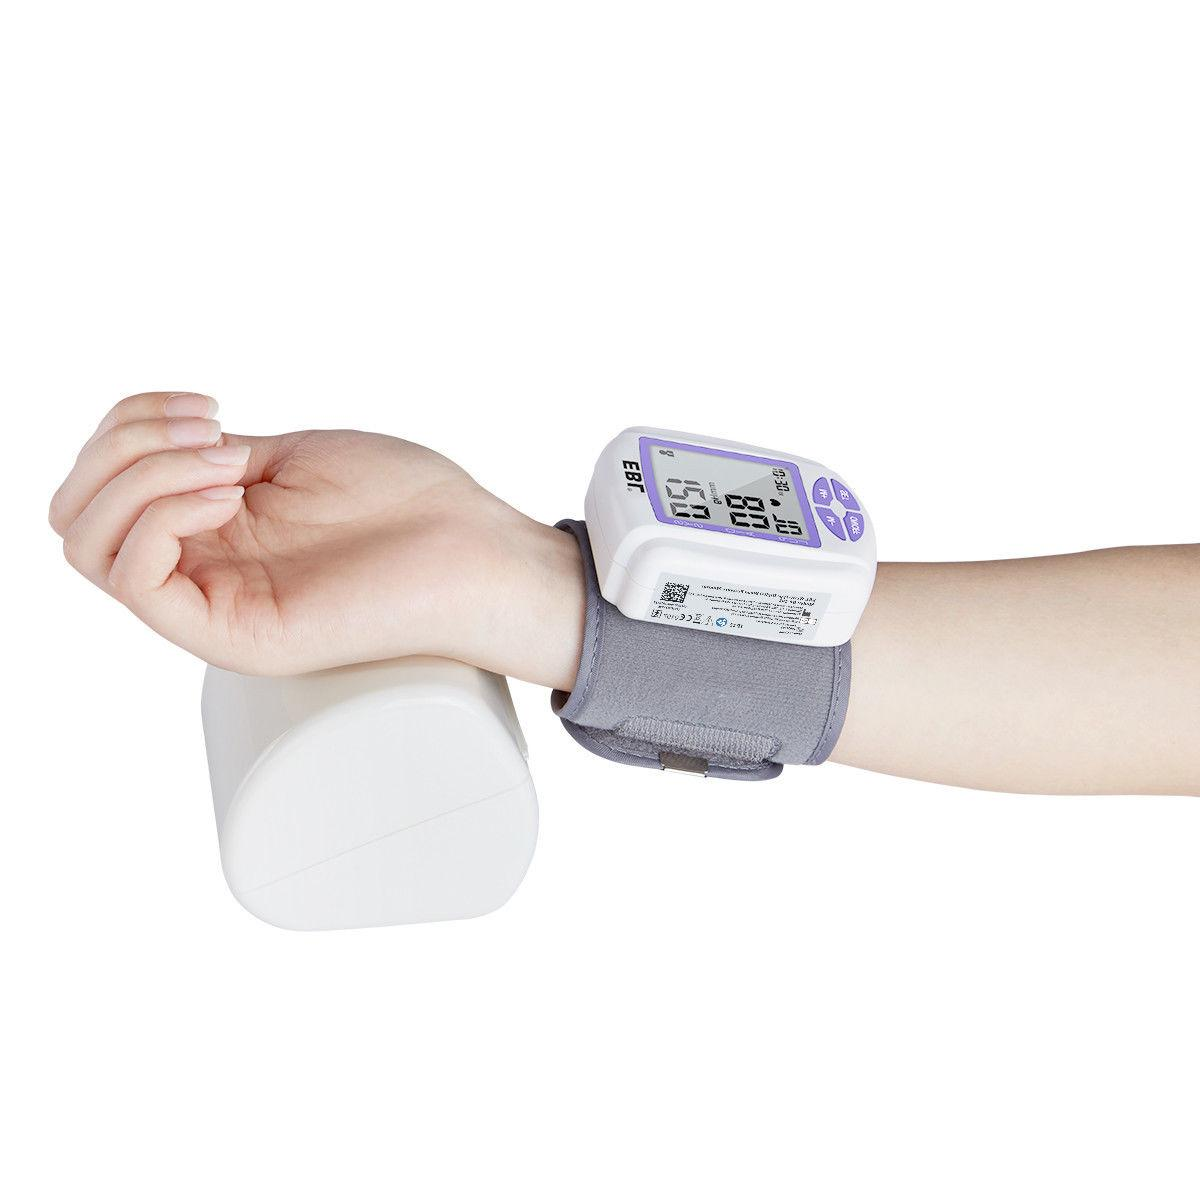 Automatic Digital Wrist Blood Pressure Monitor Machine Test